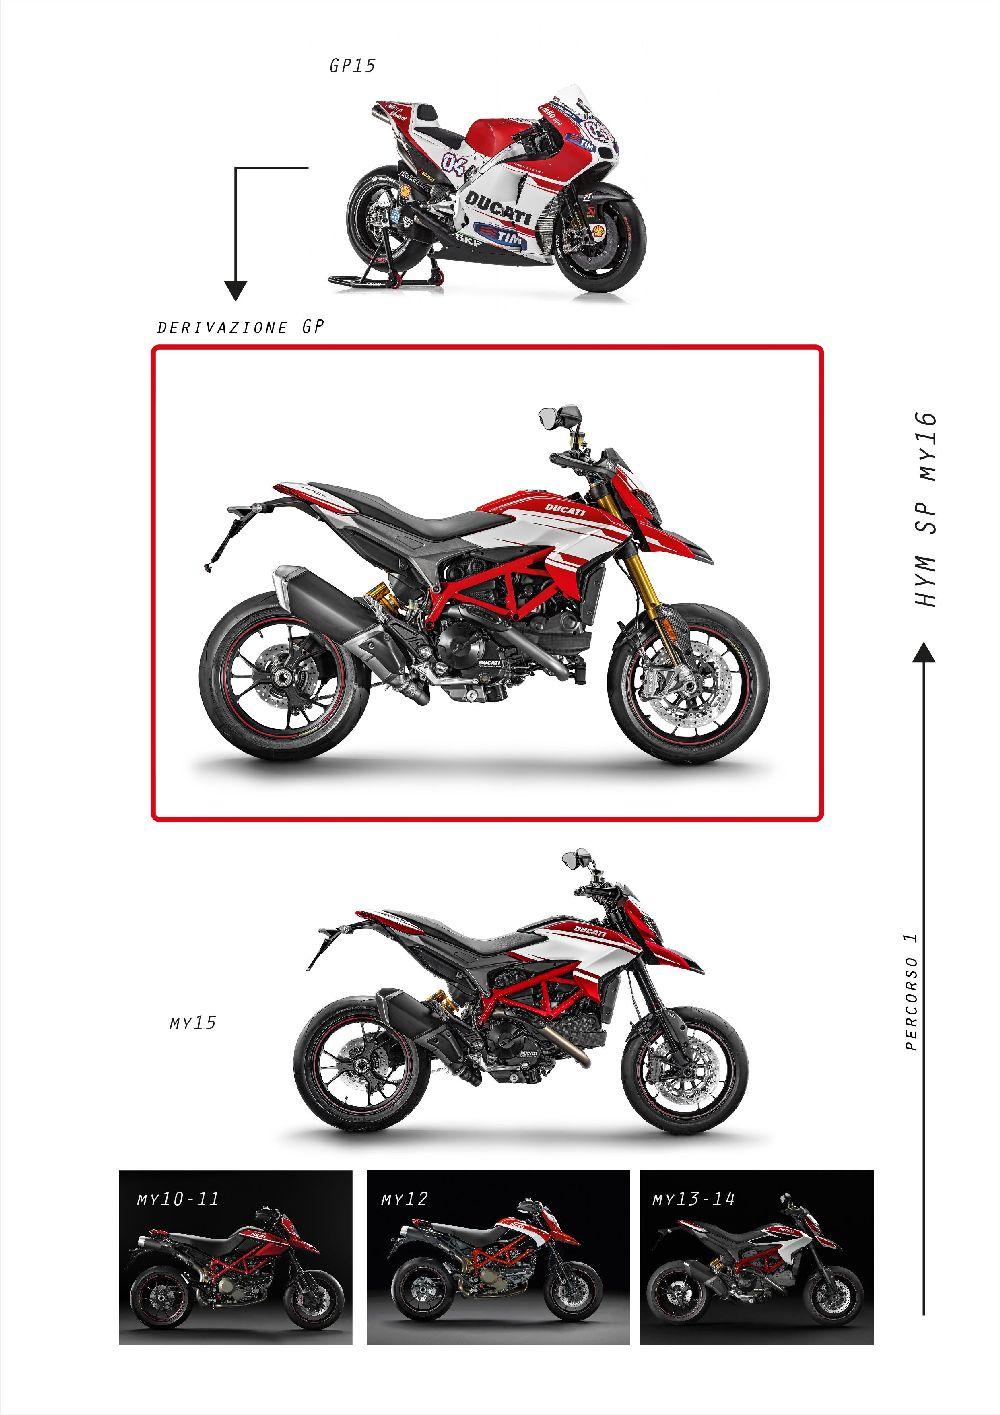 Motorok Ducati Hypermotard 2016